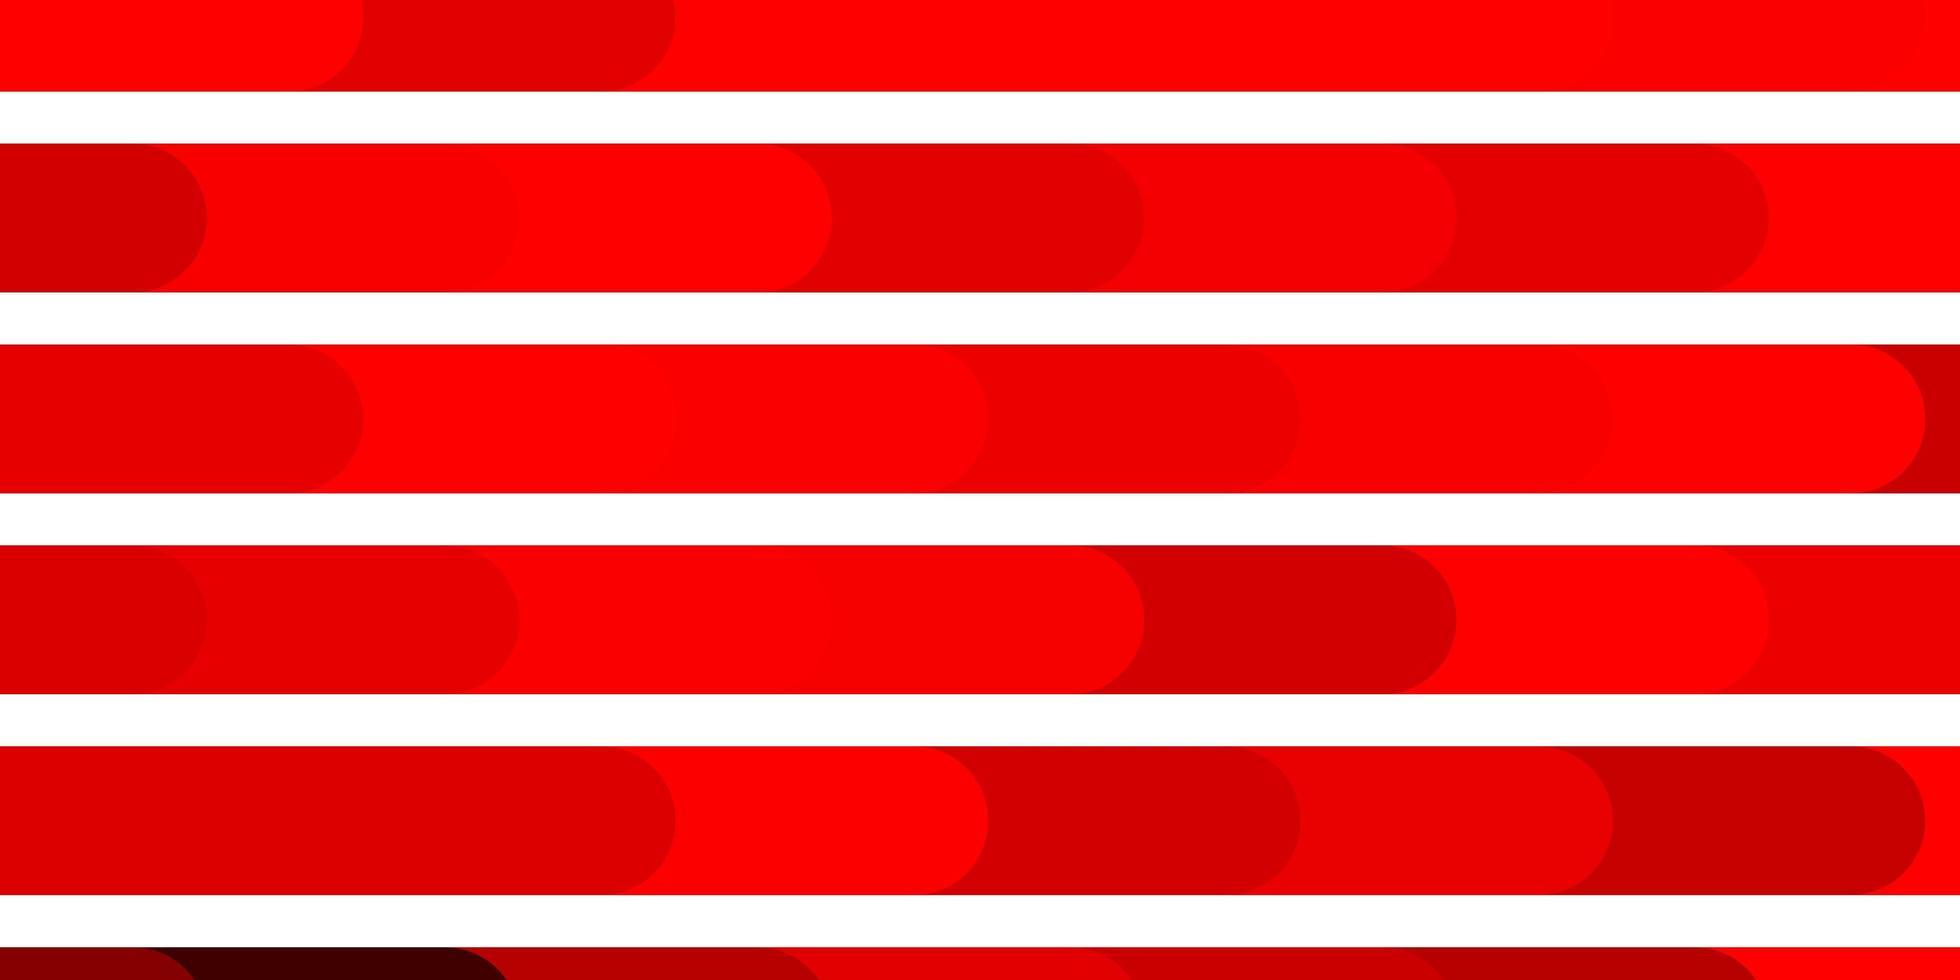 patrón de vector rojo oscuro con líneas.